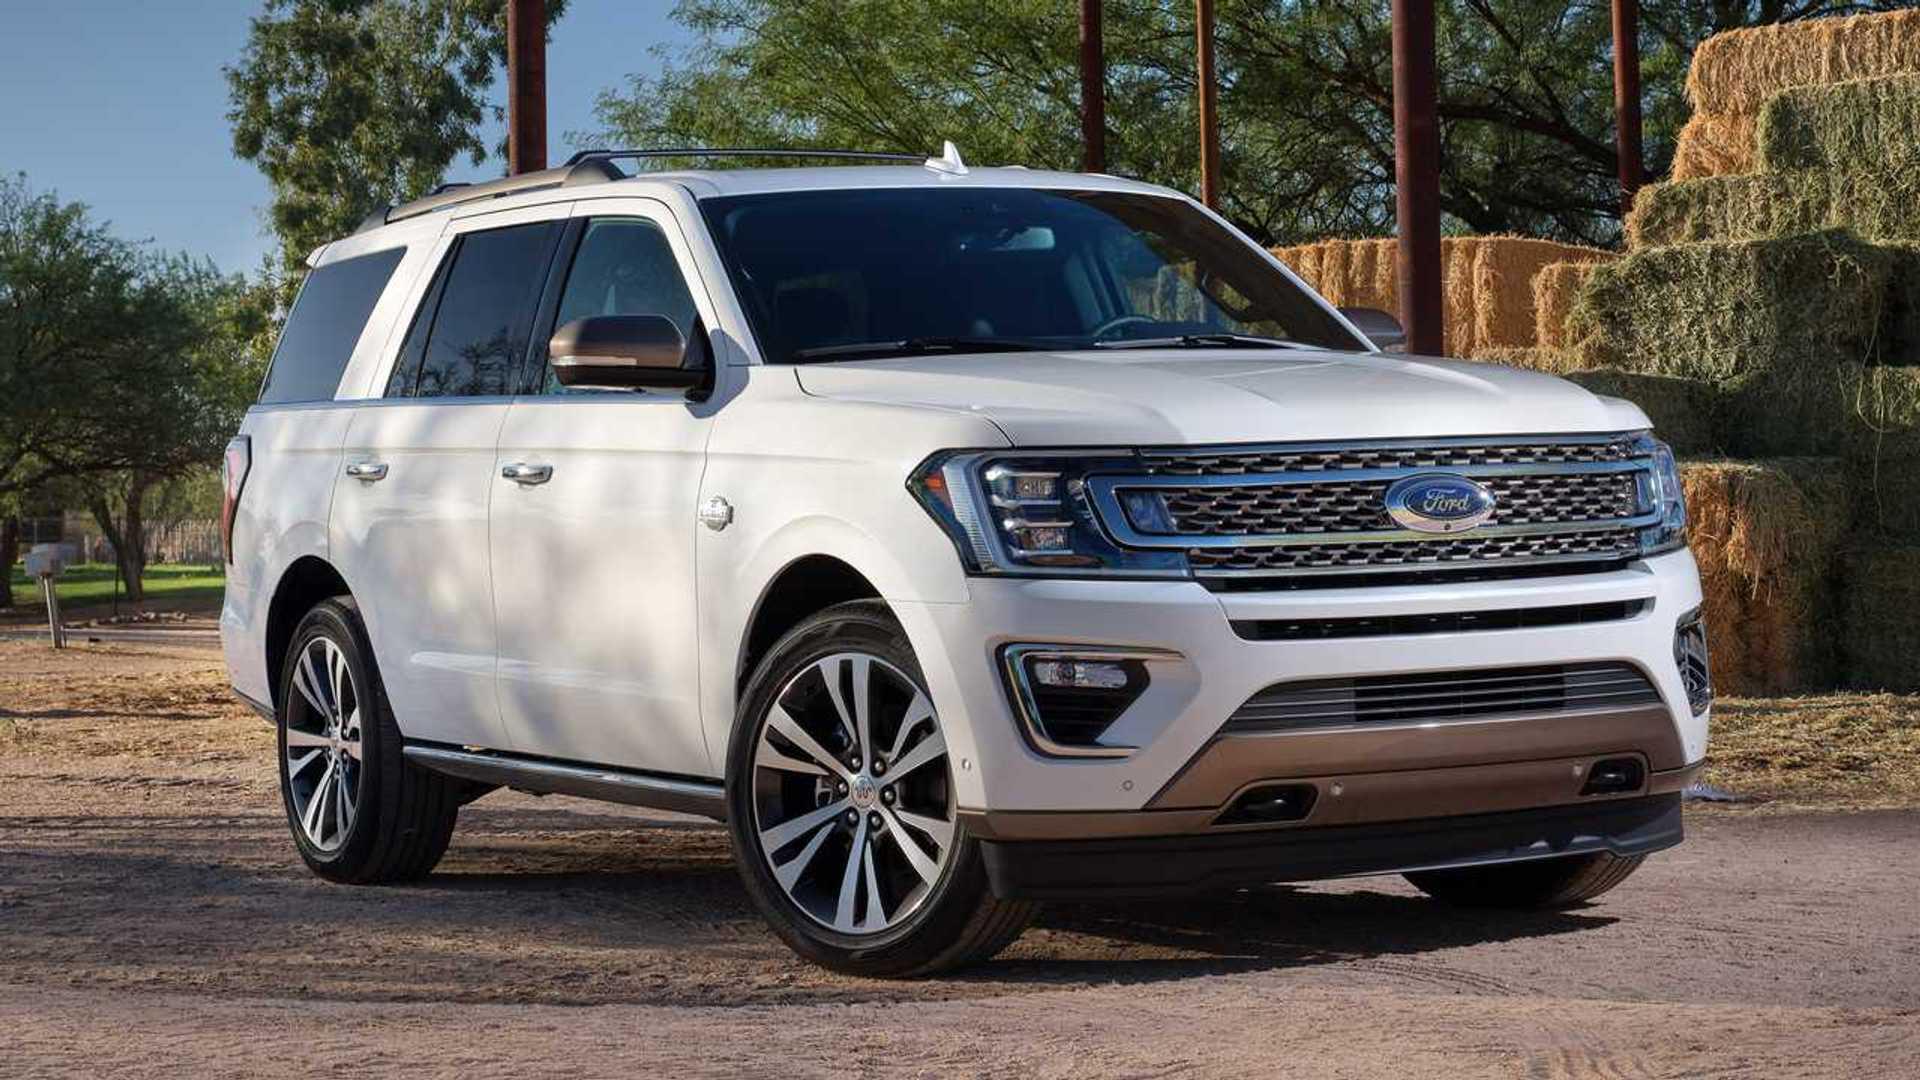 Ford Expedition News and Reviews | Motor1.com